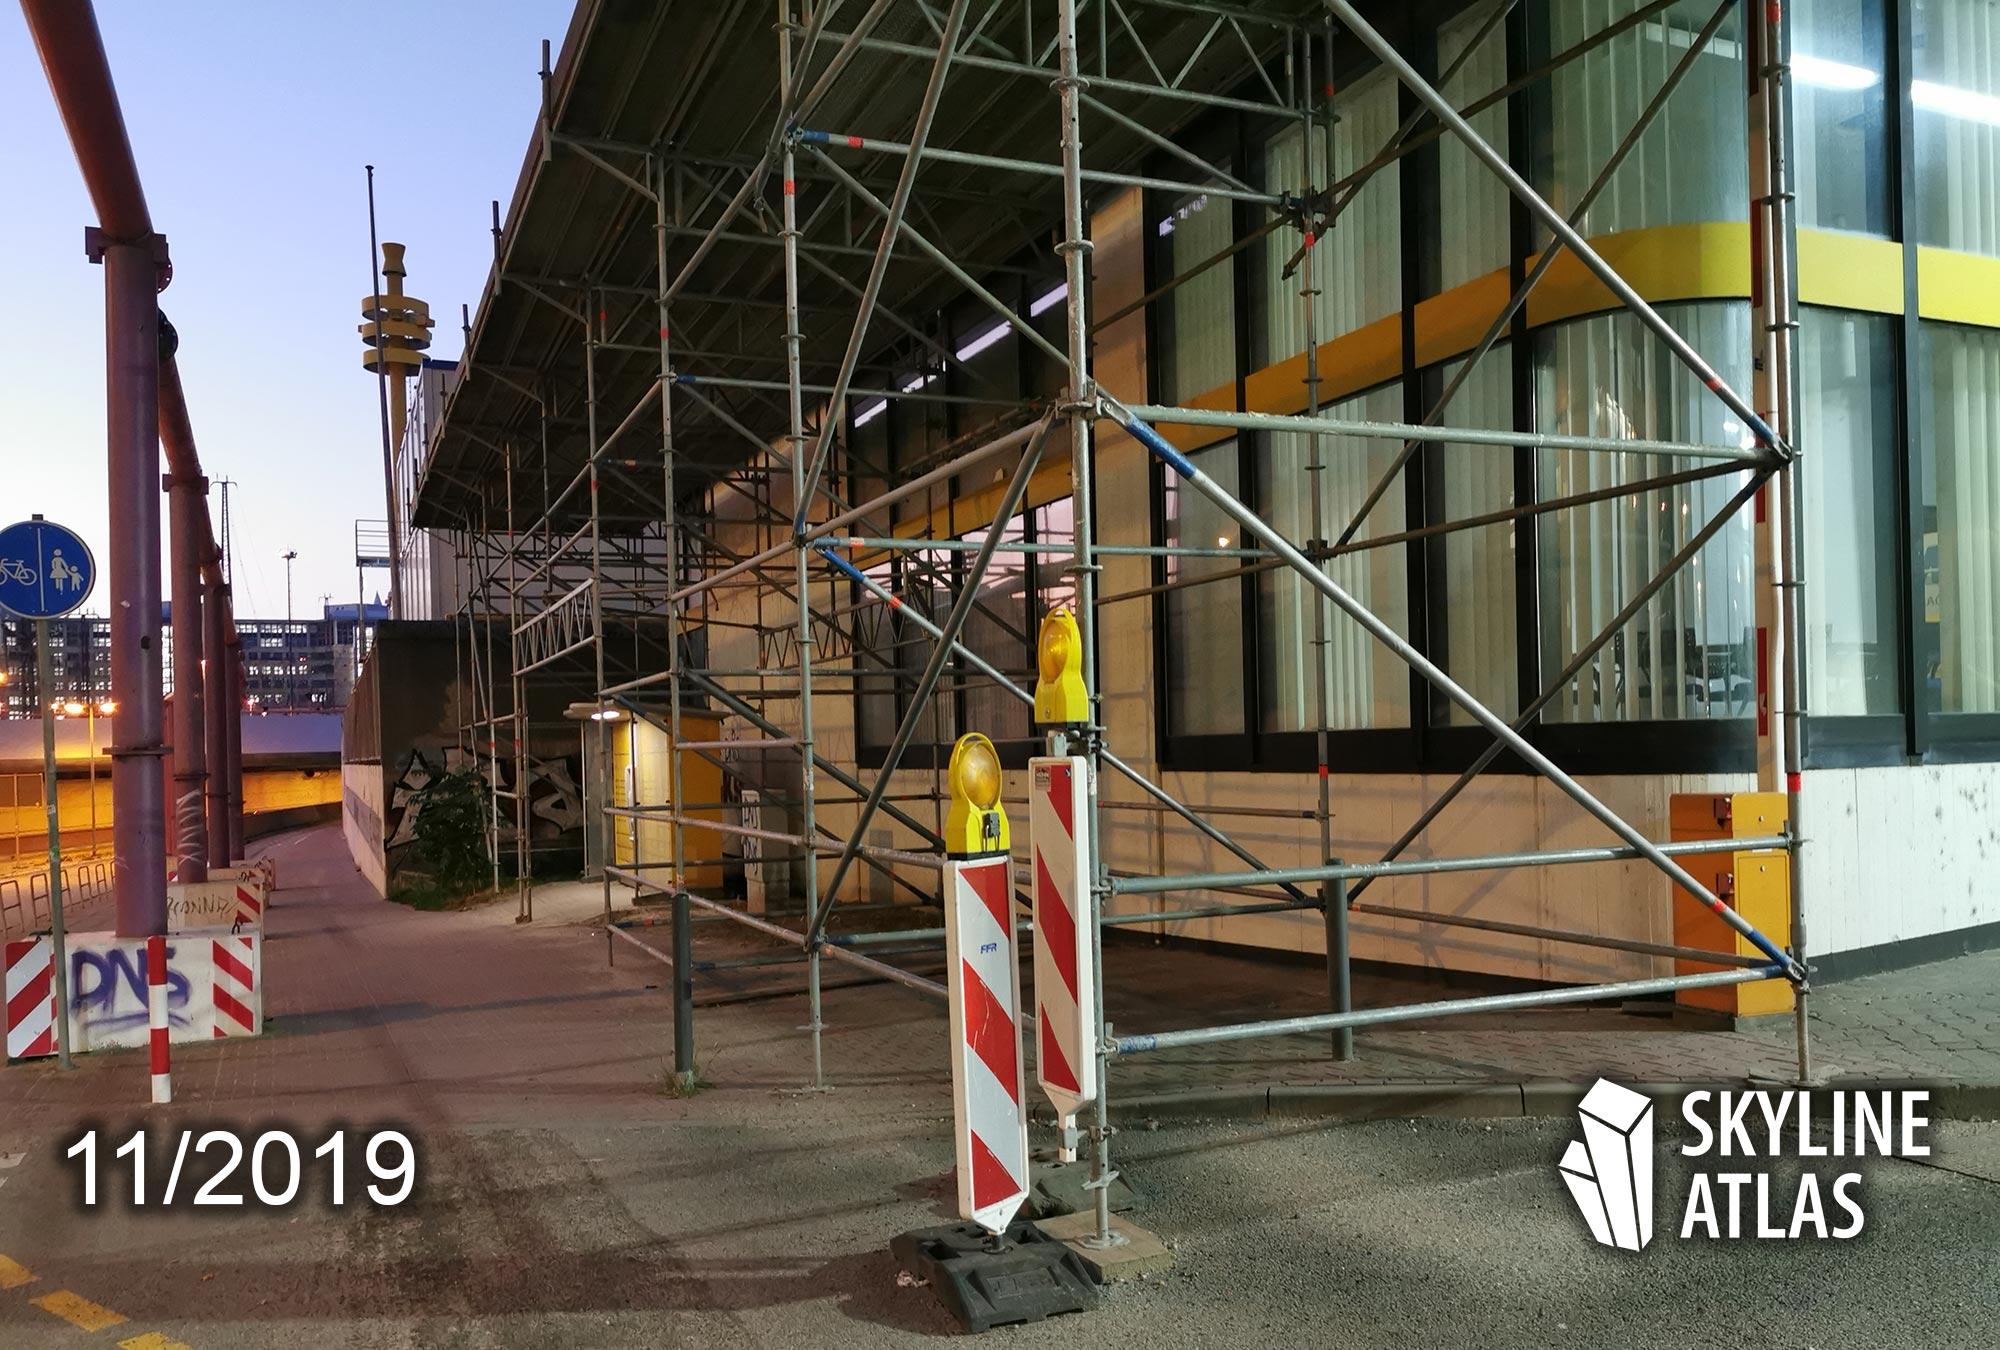 Post Highrise Frankfurt - Commerzbank Trading Center - November 2019